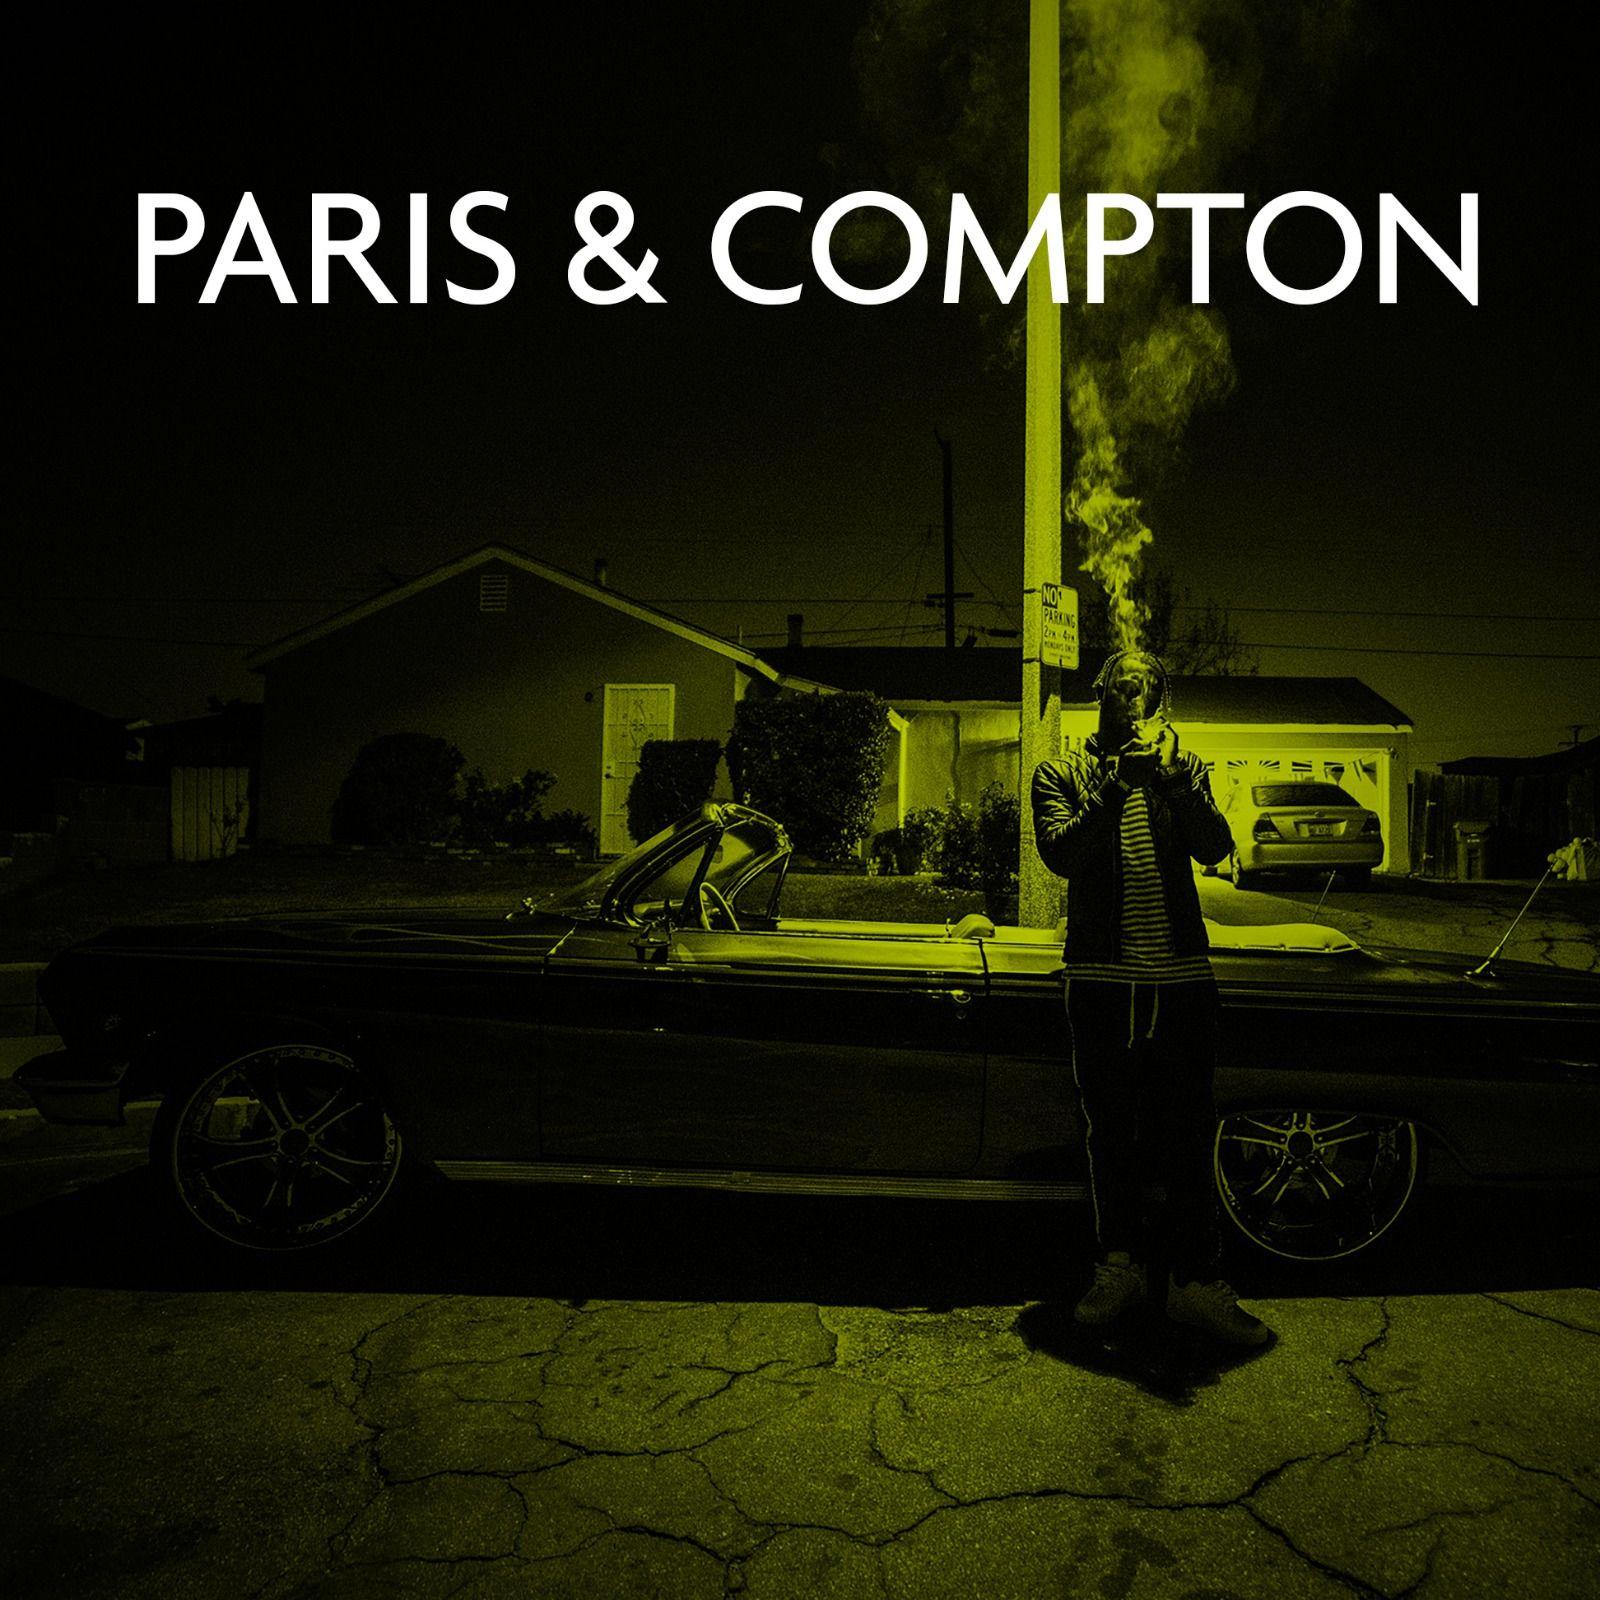 Paris and Compton